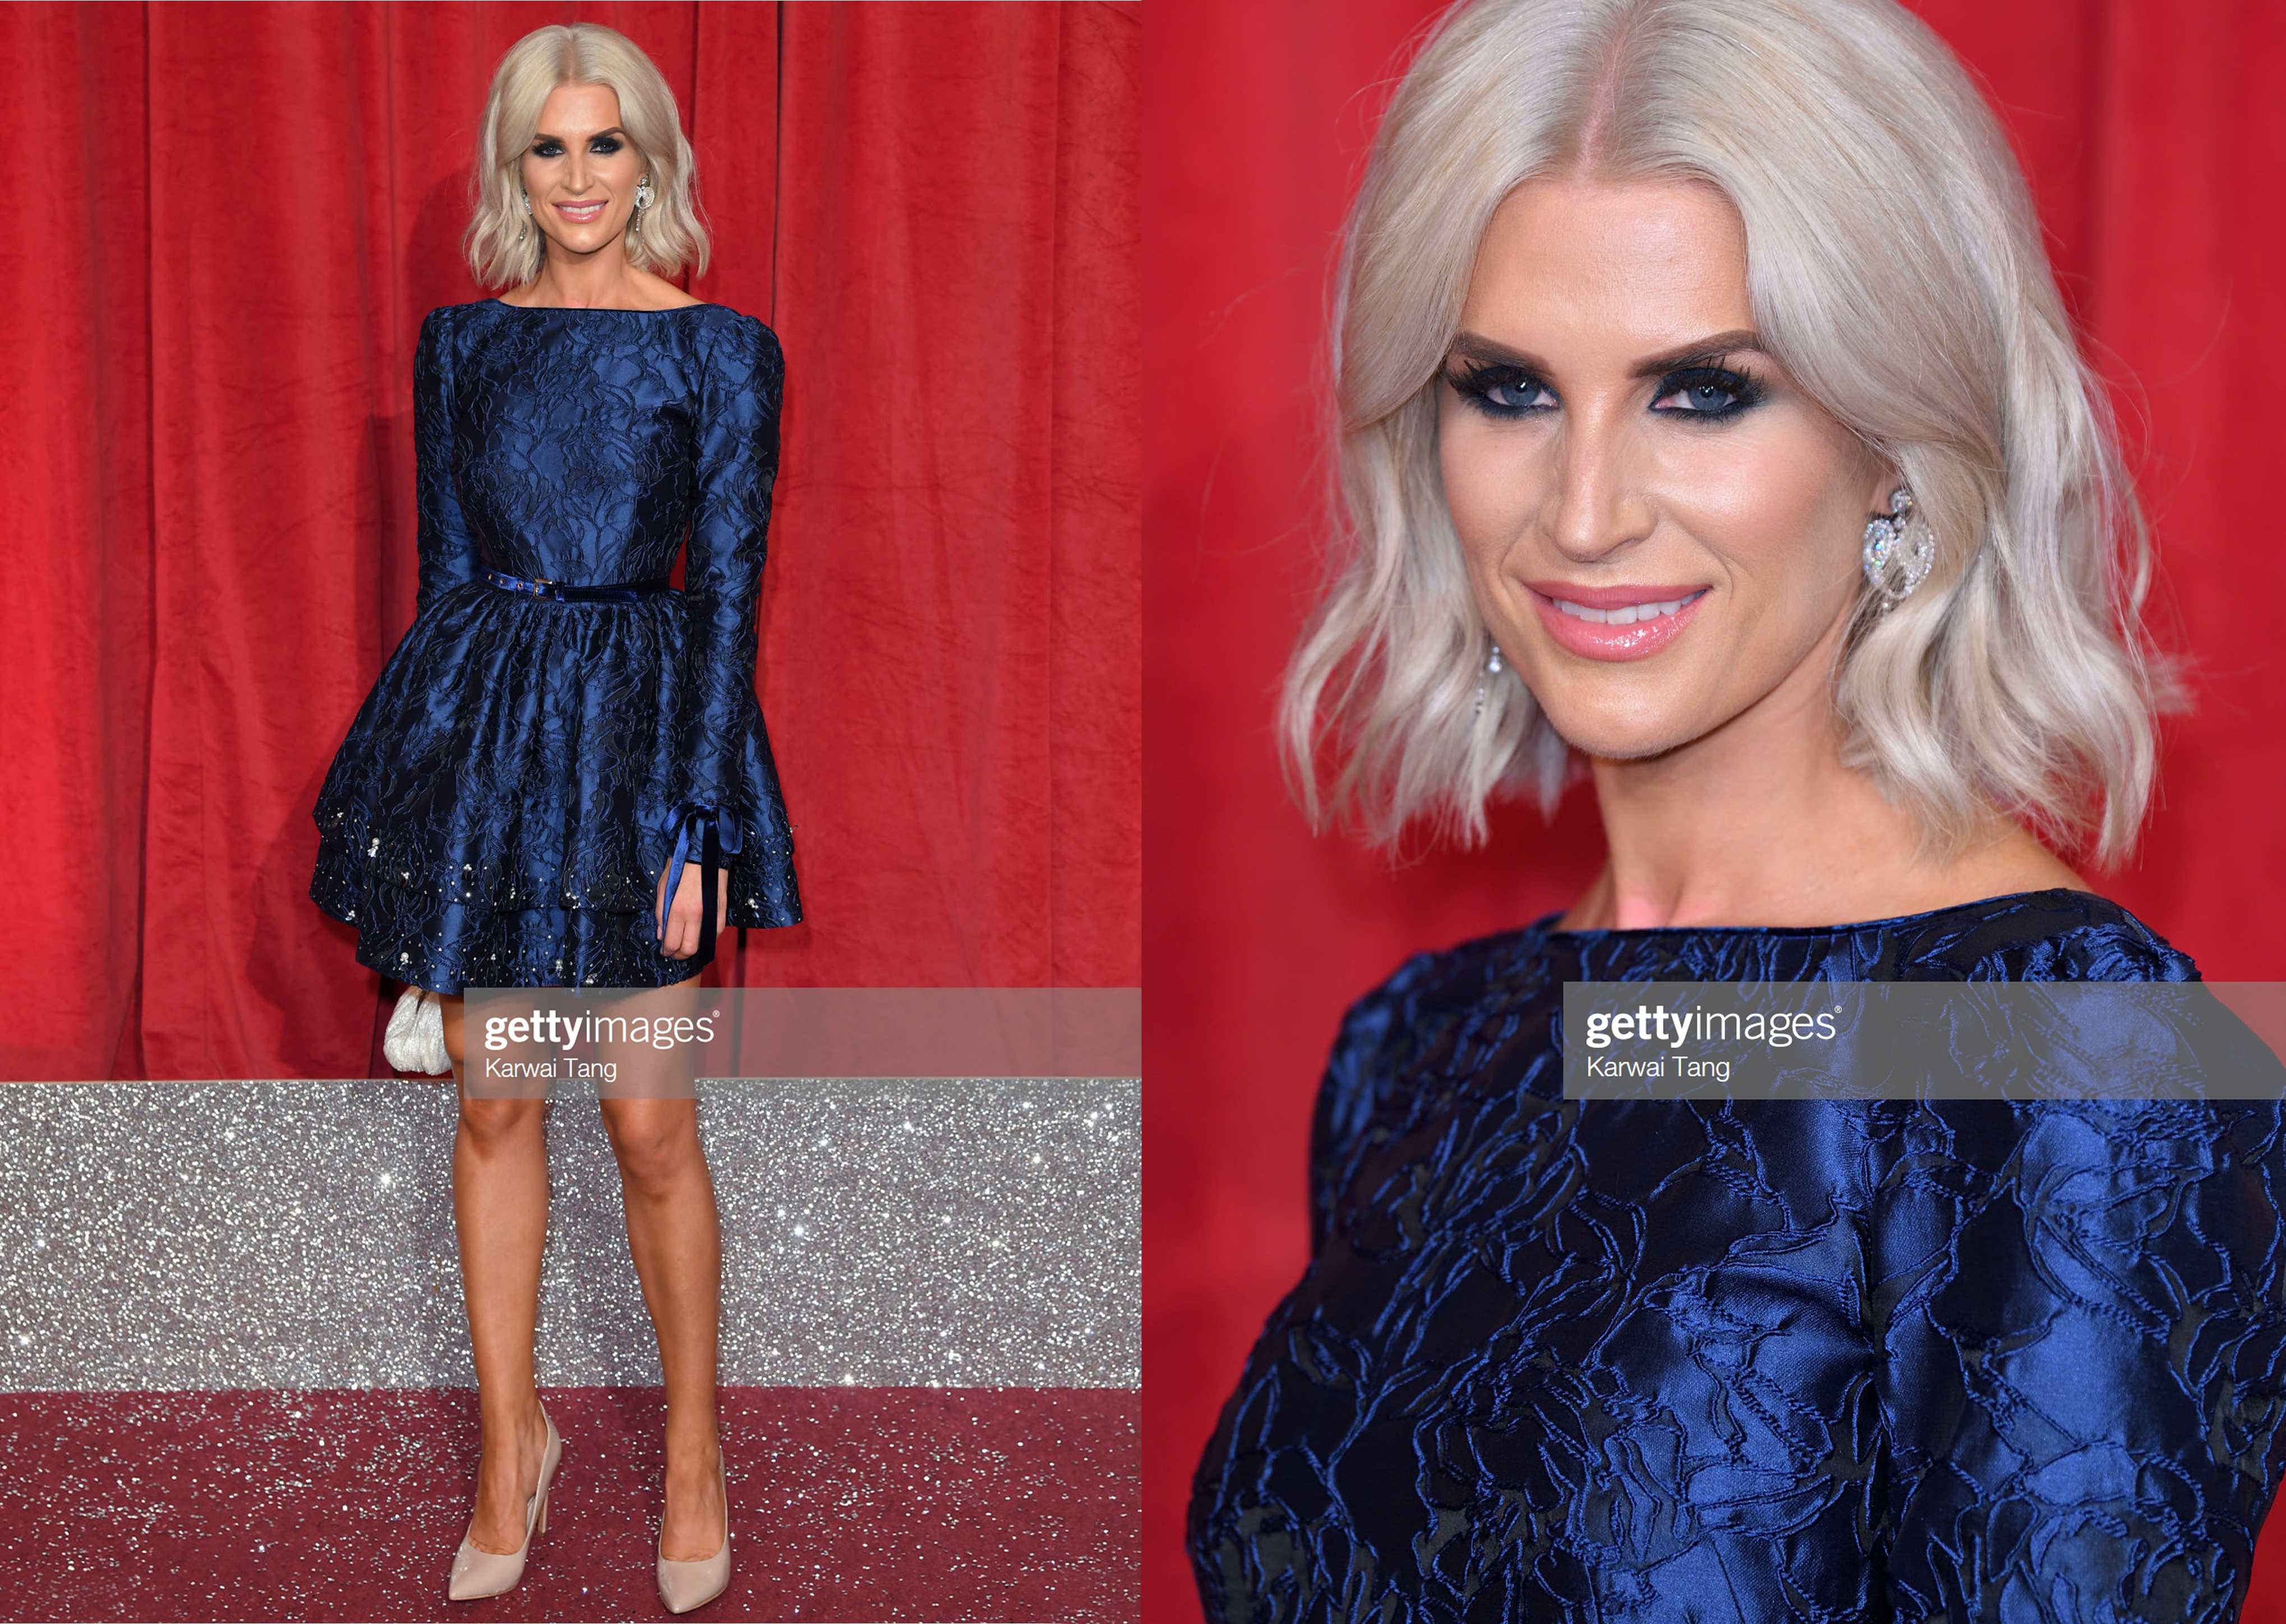 SARAH JAYNE DUNN DRESSED BY RAQUEL BALENCIA FOR BRITISH SOAP WARDS 2019